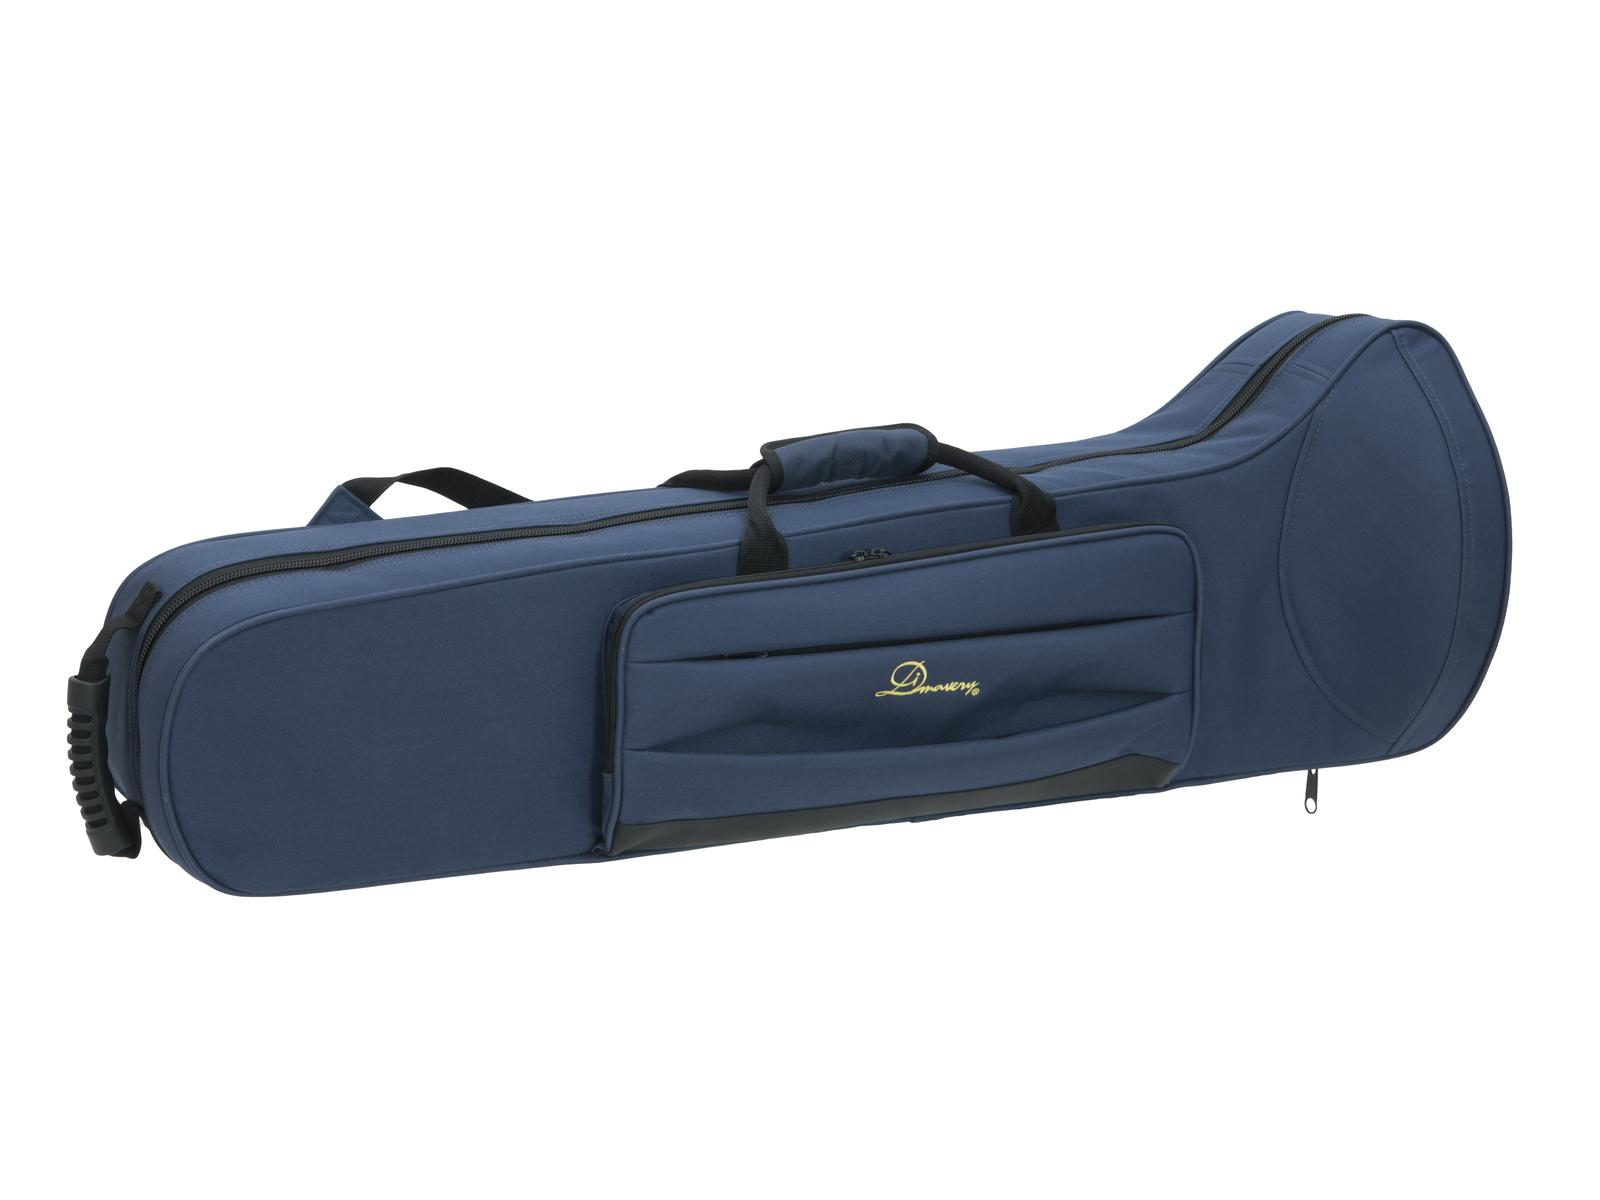 Custodia, borsa  per Trombone, blu, DIMAVERY